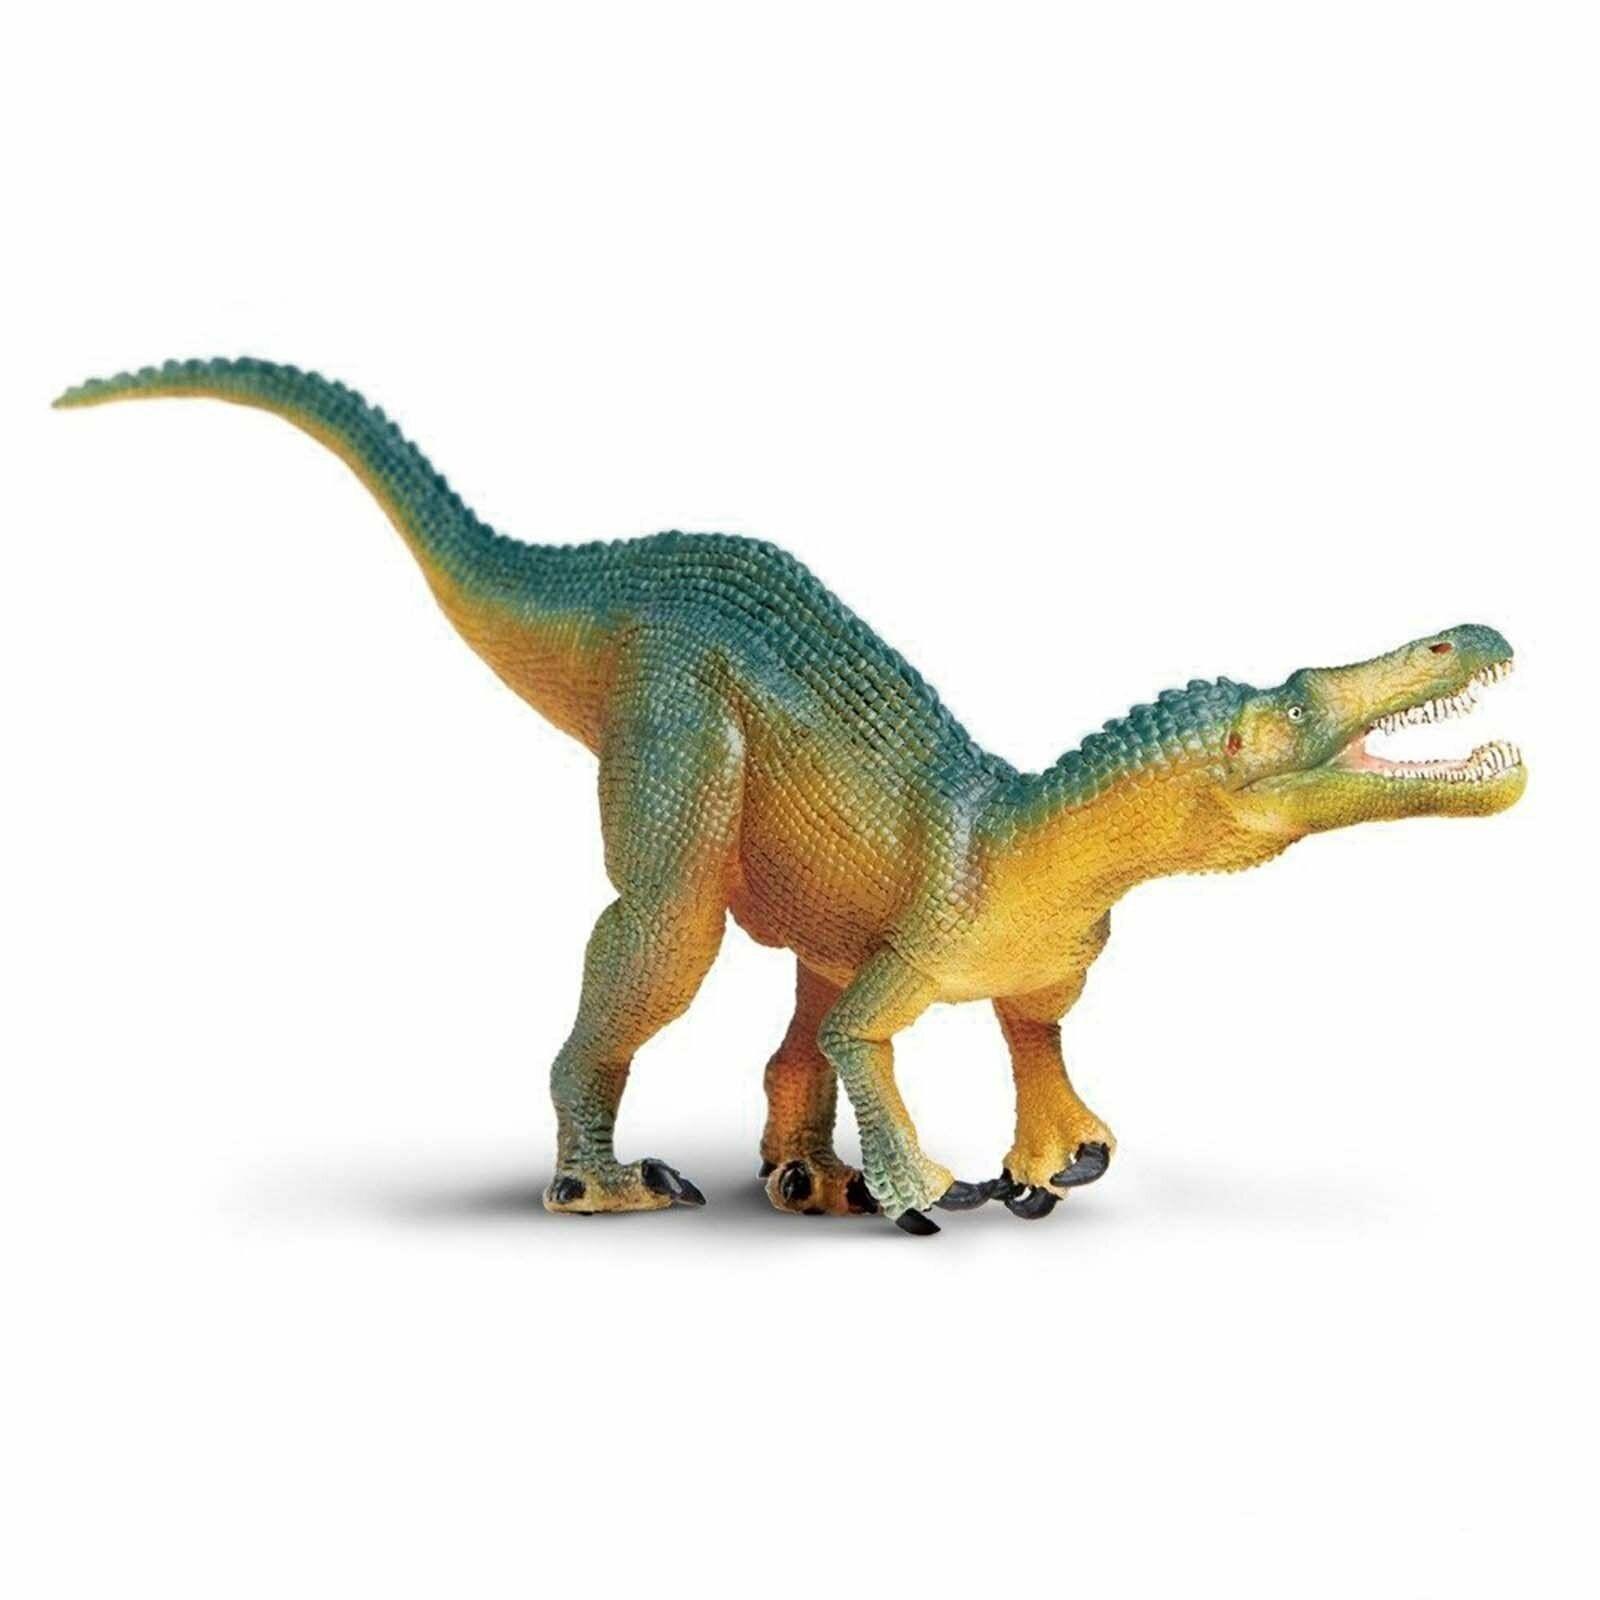 CollectA Prehistoric Life Cryolophosaurus Toy Dinosaur Figure #88222 Model Play